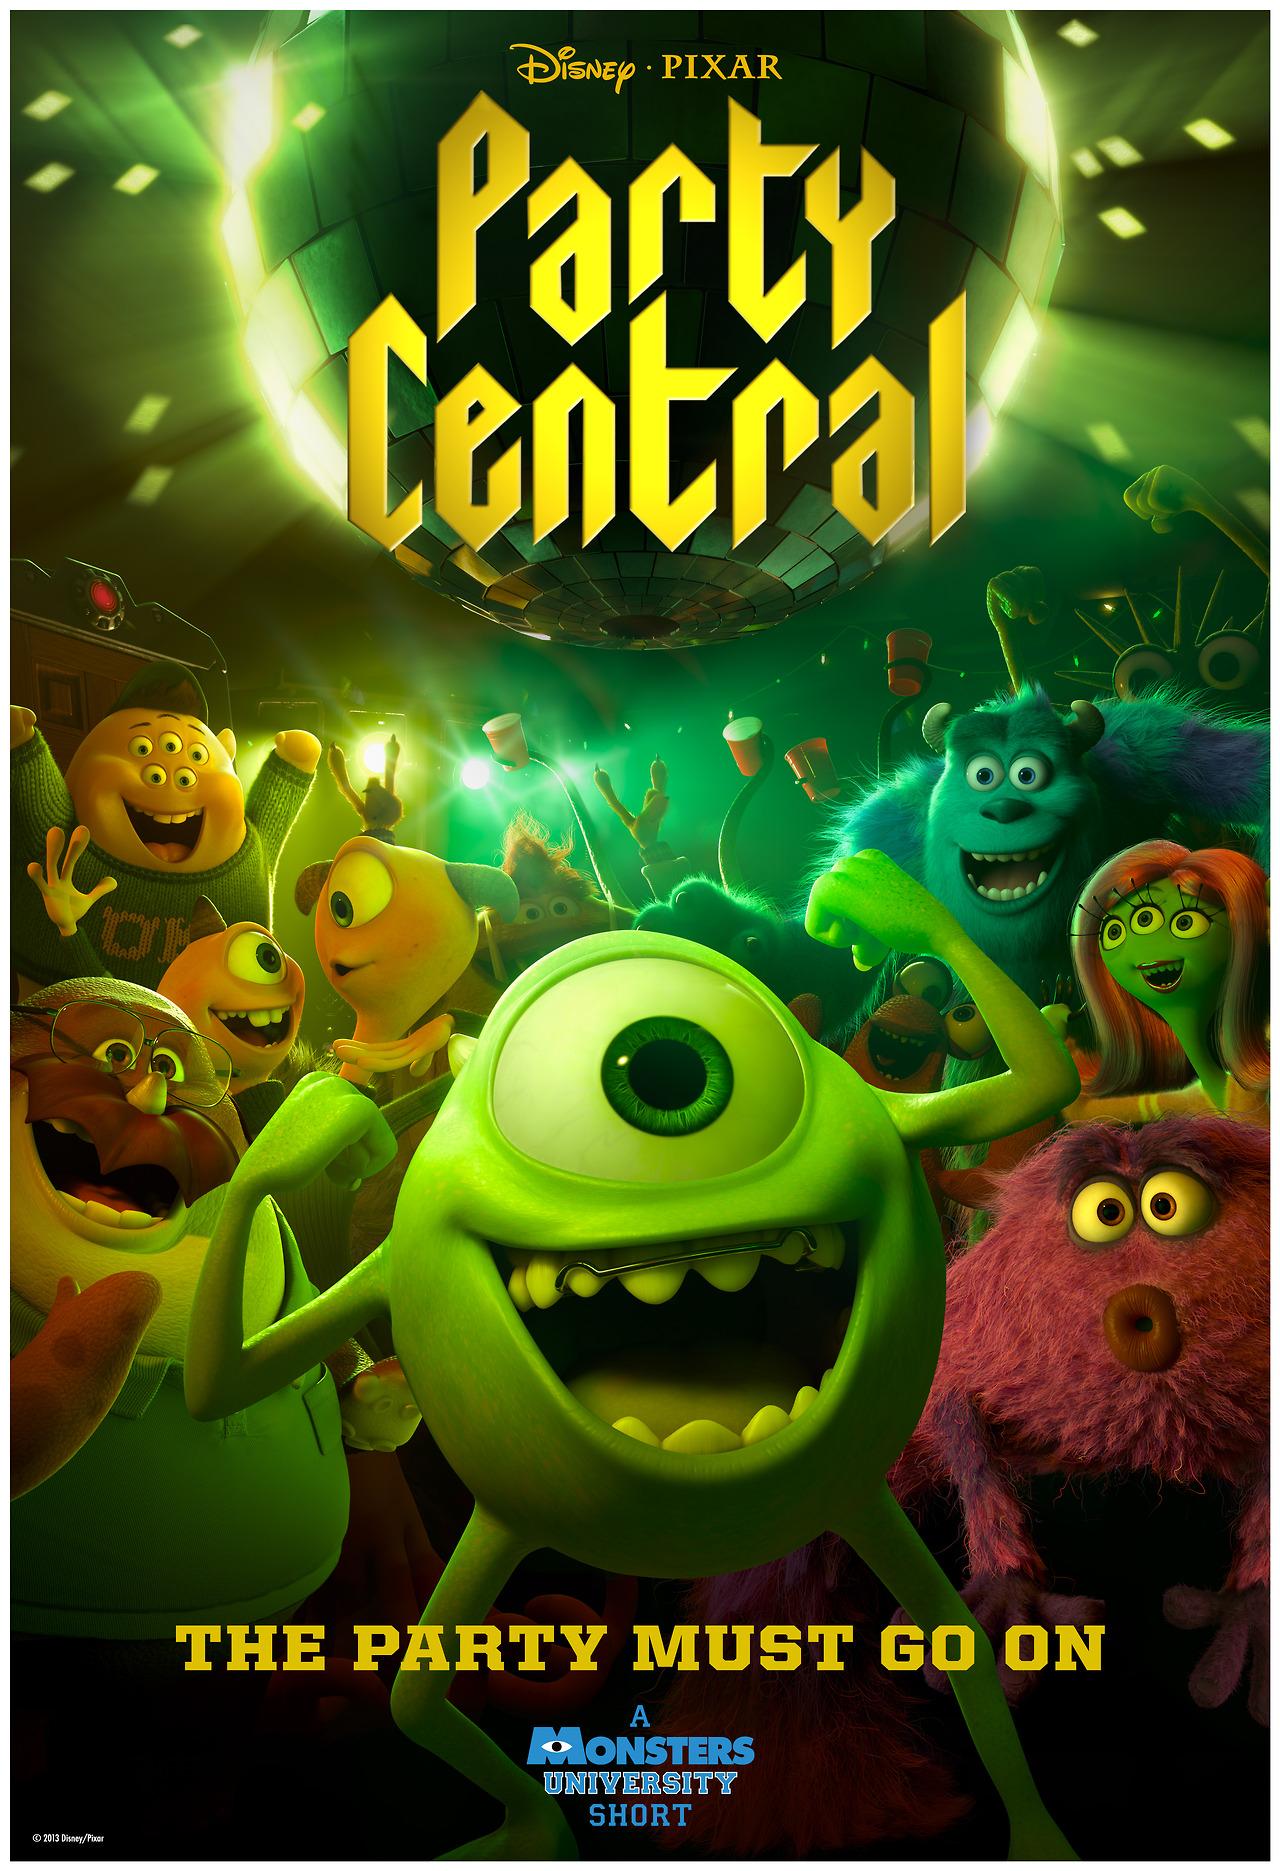 affiche poster party central disney pixar